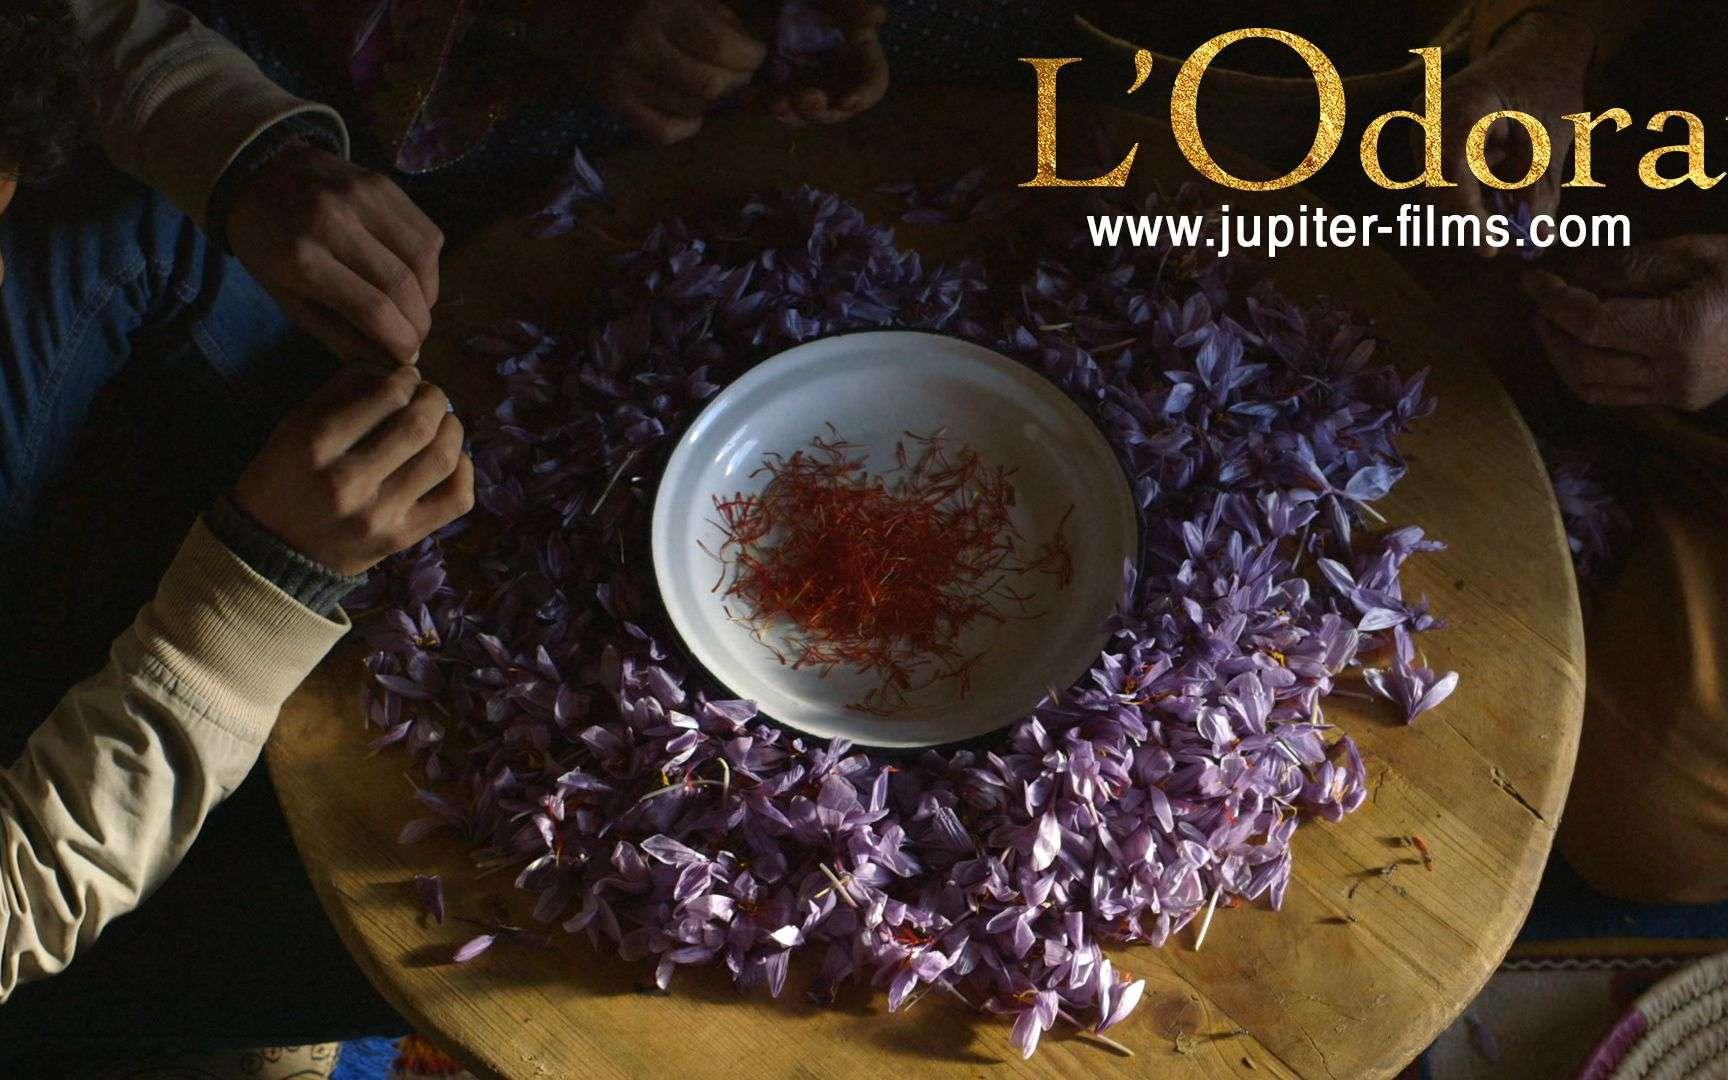 Le film Odorat sera projeté en ligne le 24 février à 19h30. © Jupiter Films